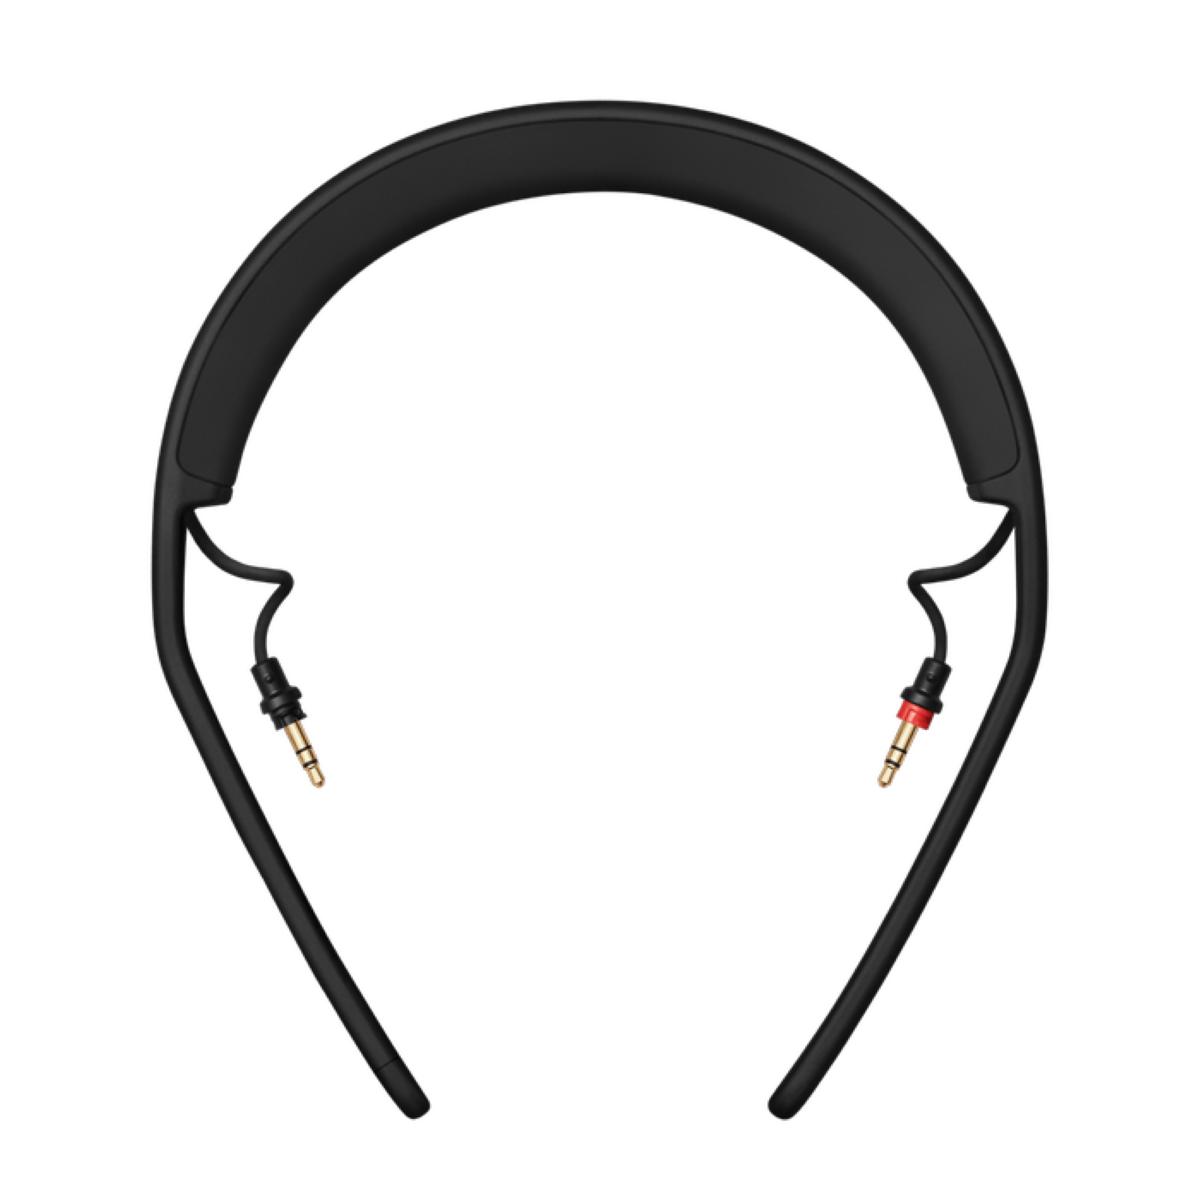 TMA-2 H05 Headband